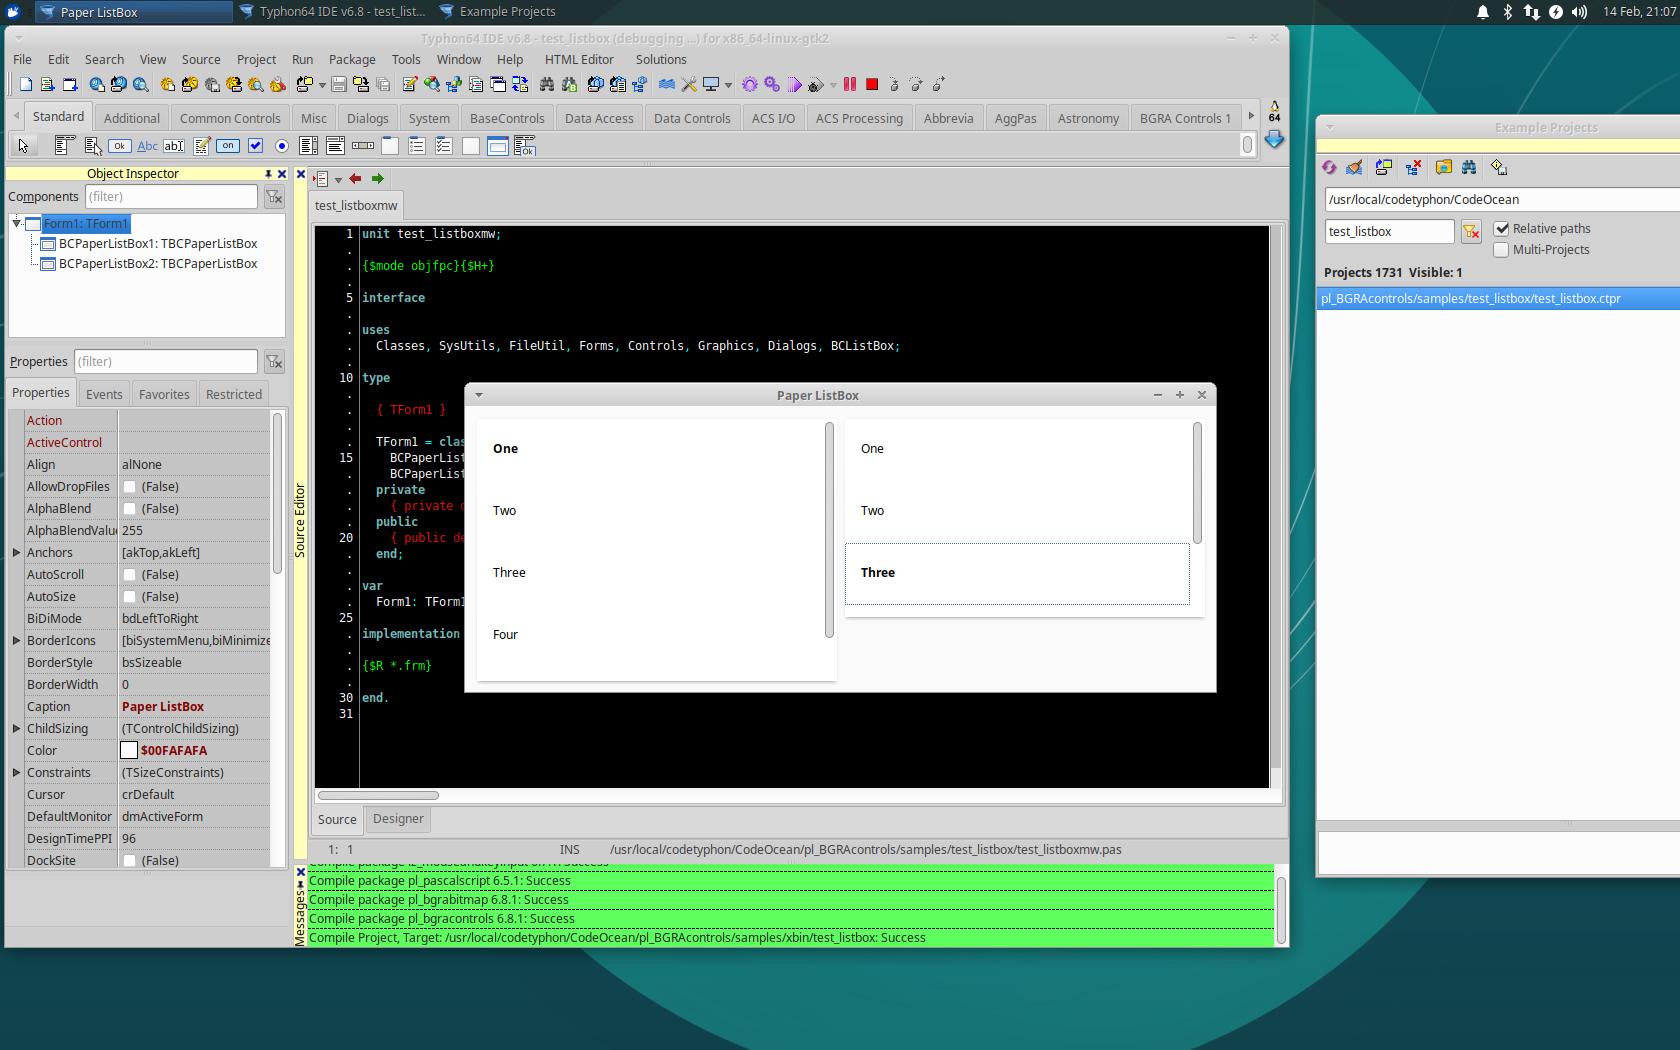 Xubuntu64-1804-2019-02-14-3_2019-02-14.jpg